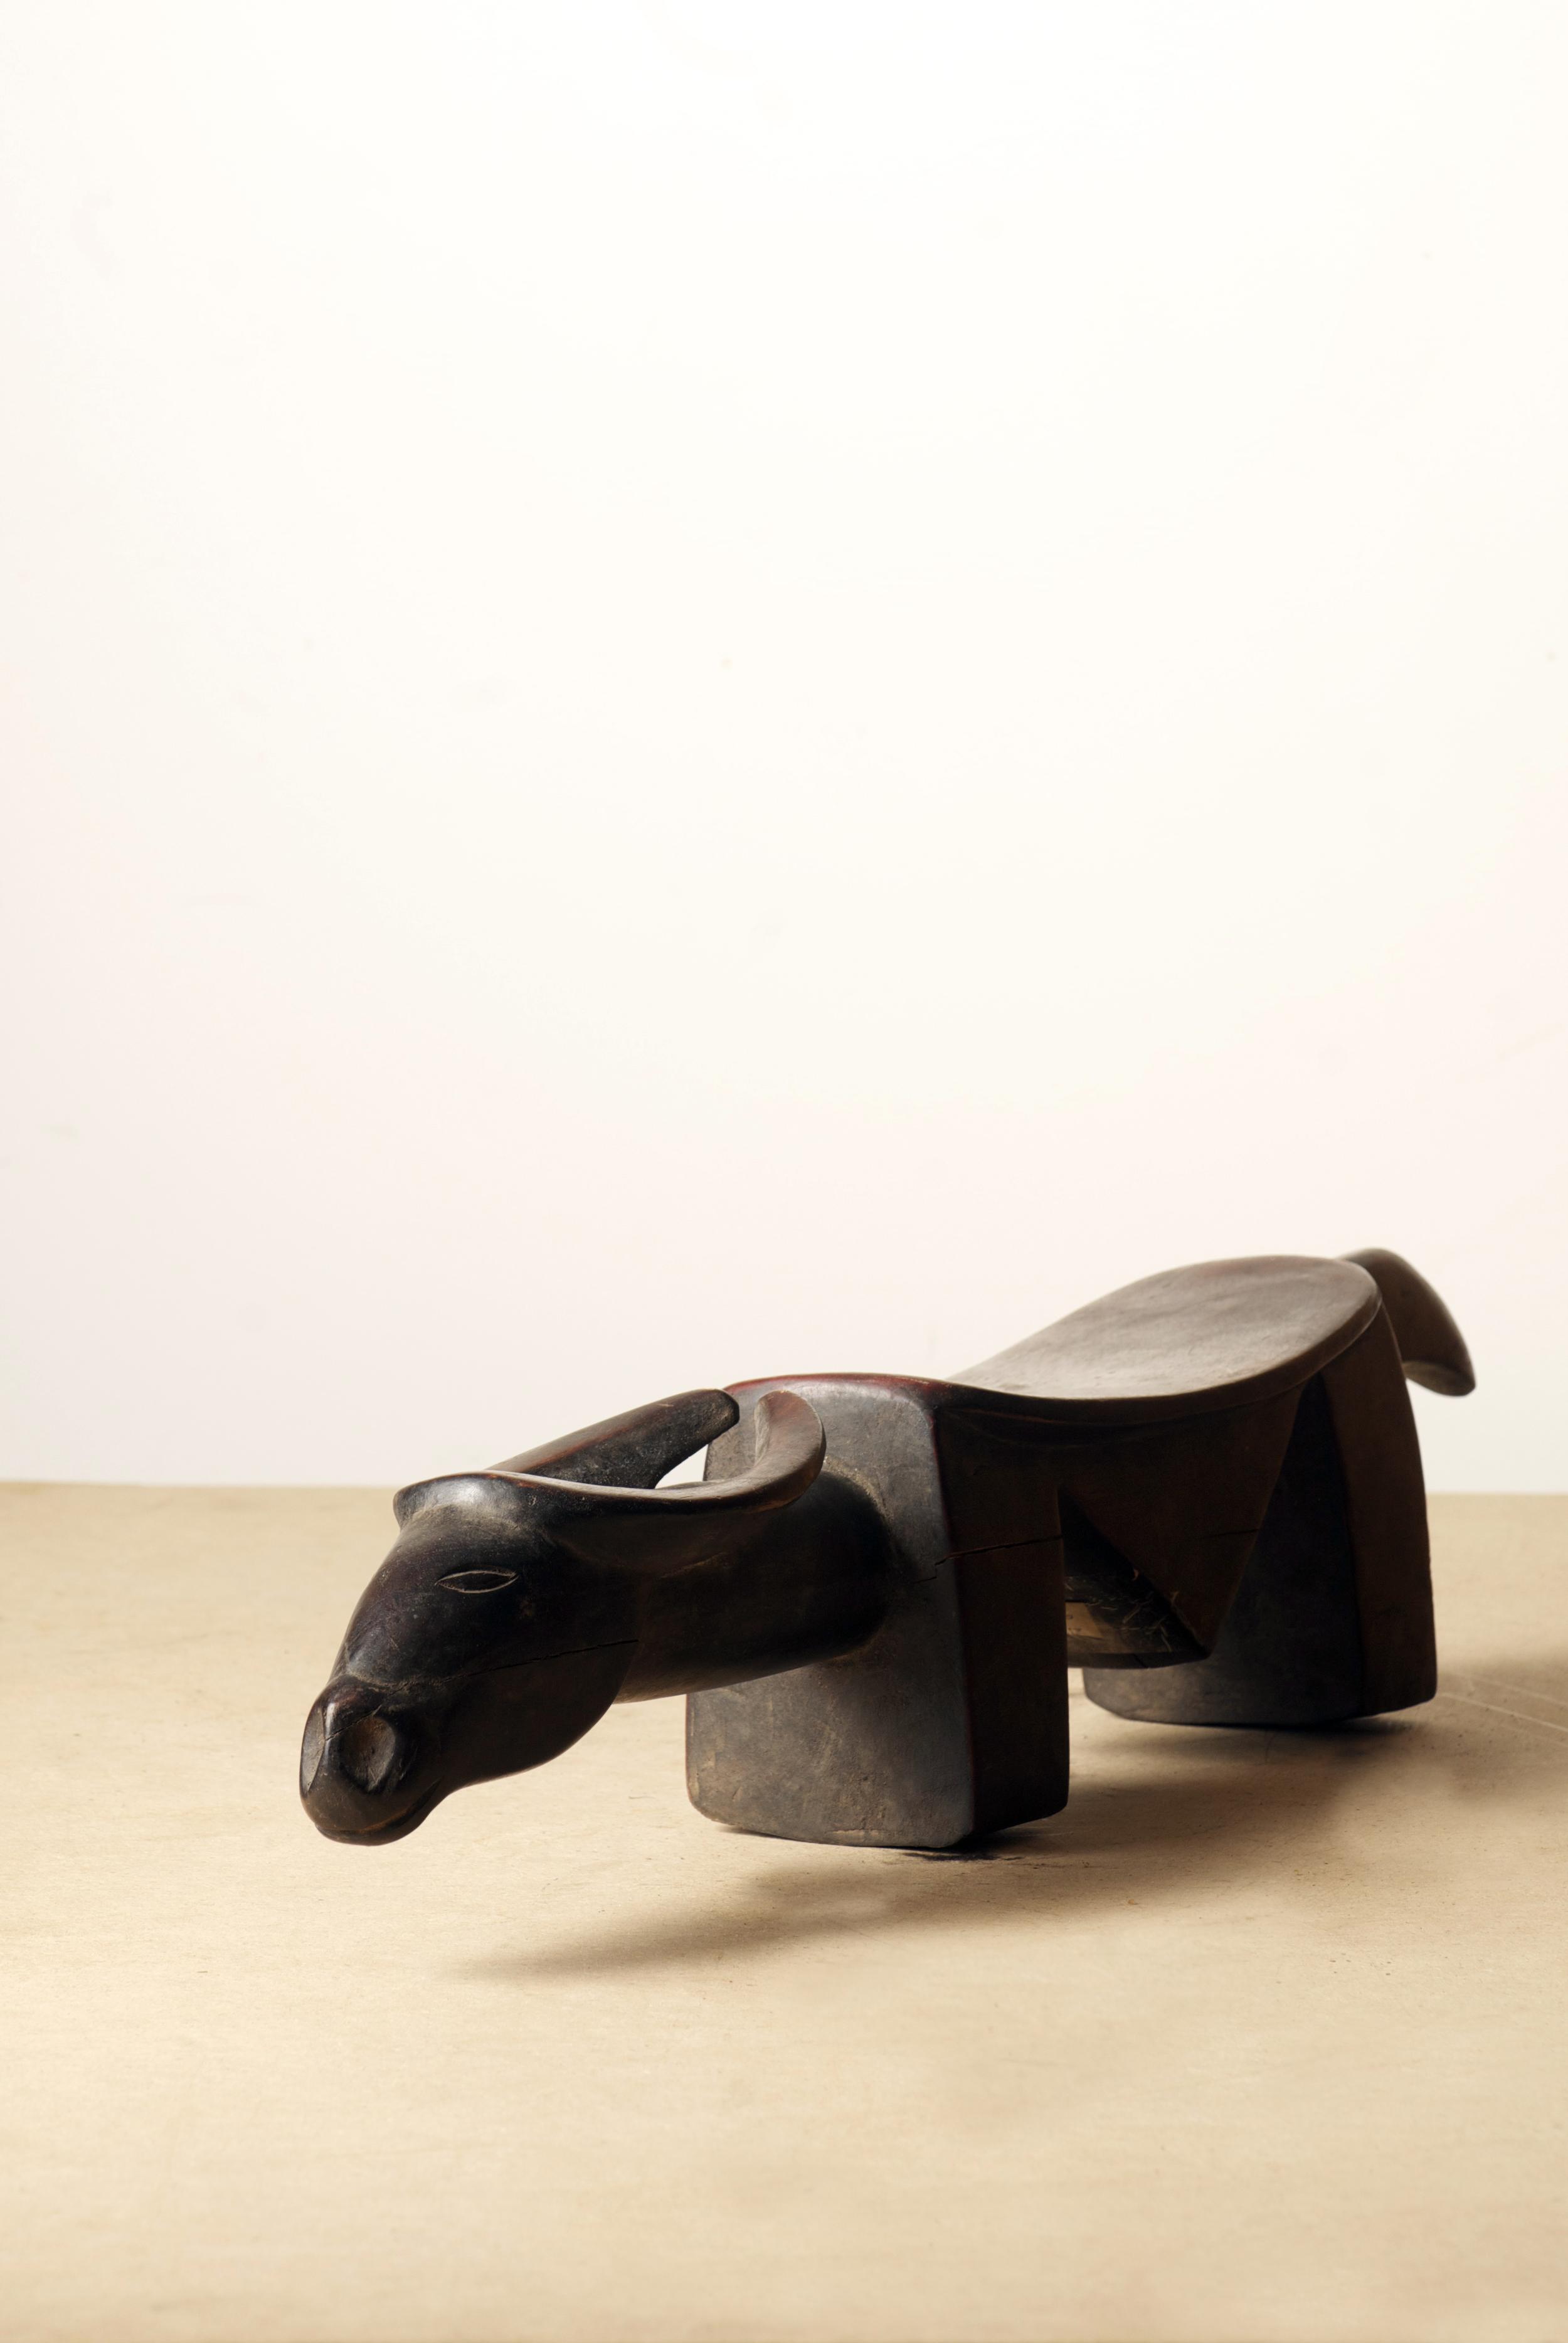 Senoufo Headrest, Cote D'ivoire, Dim. 27.1inch.Pp.$270.00.jpg